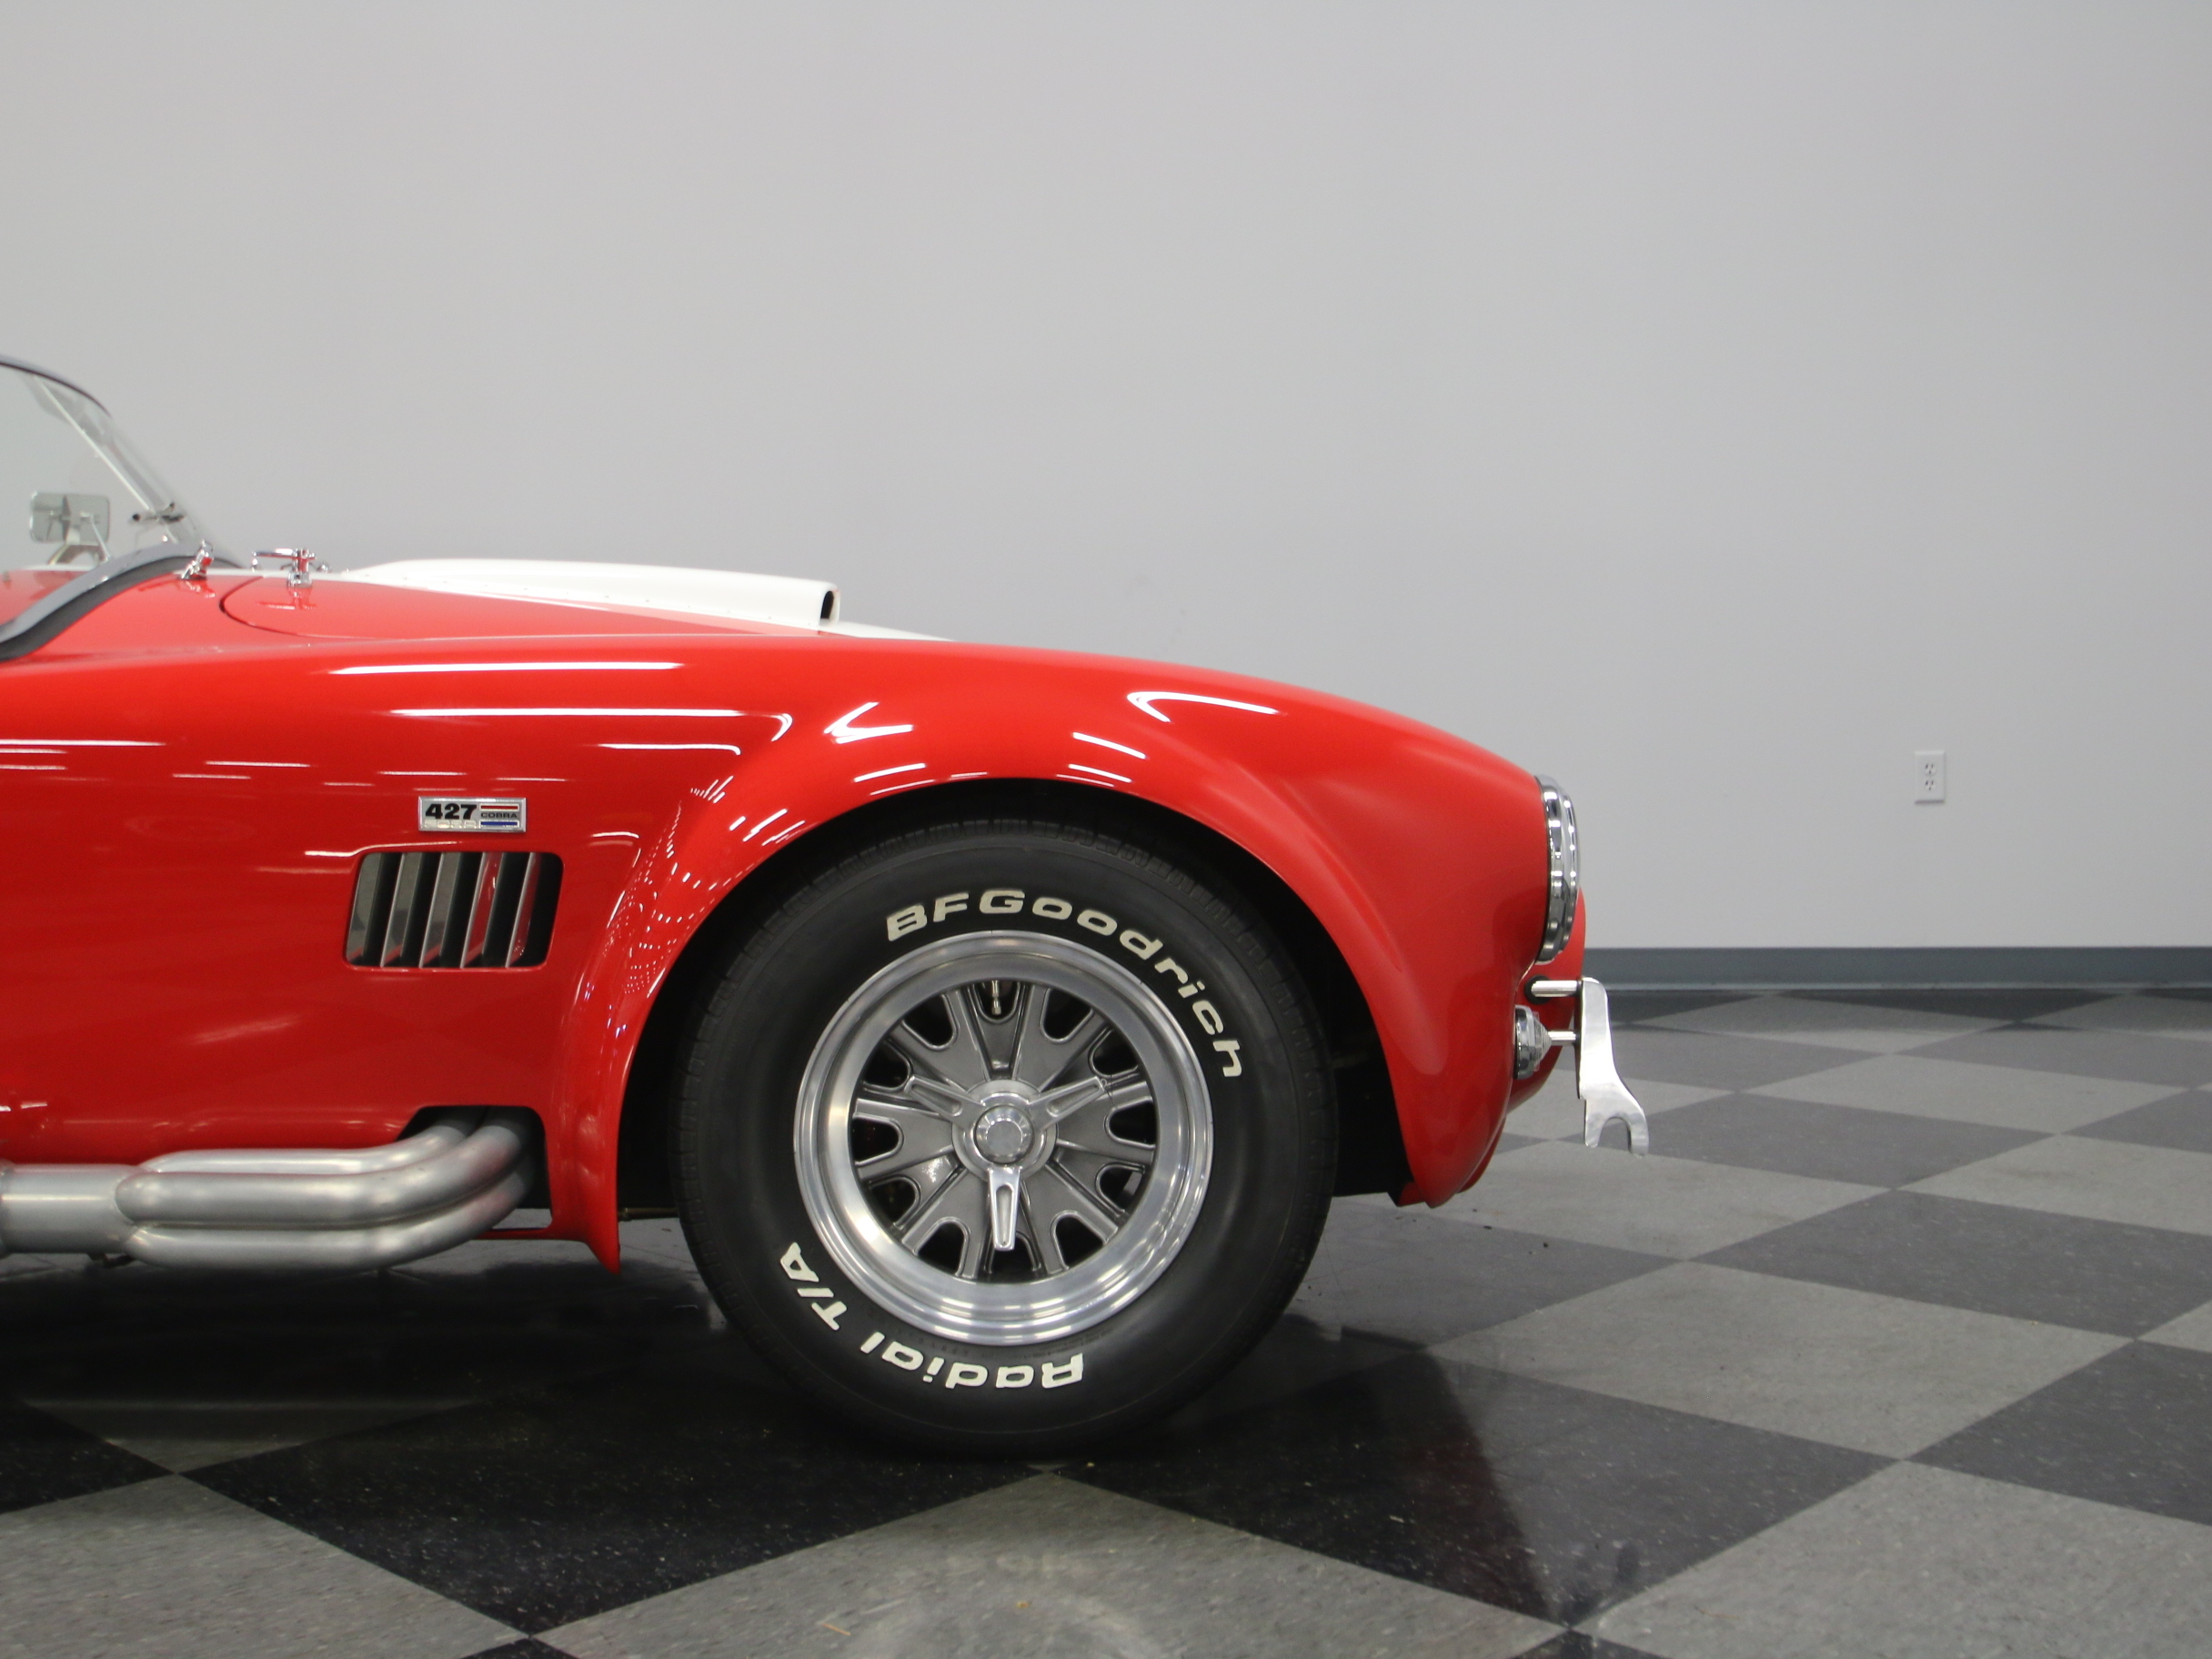 0465-NSH | 1965 Shelby Cobra Superformance | Streetside Classics